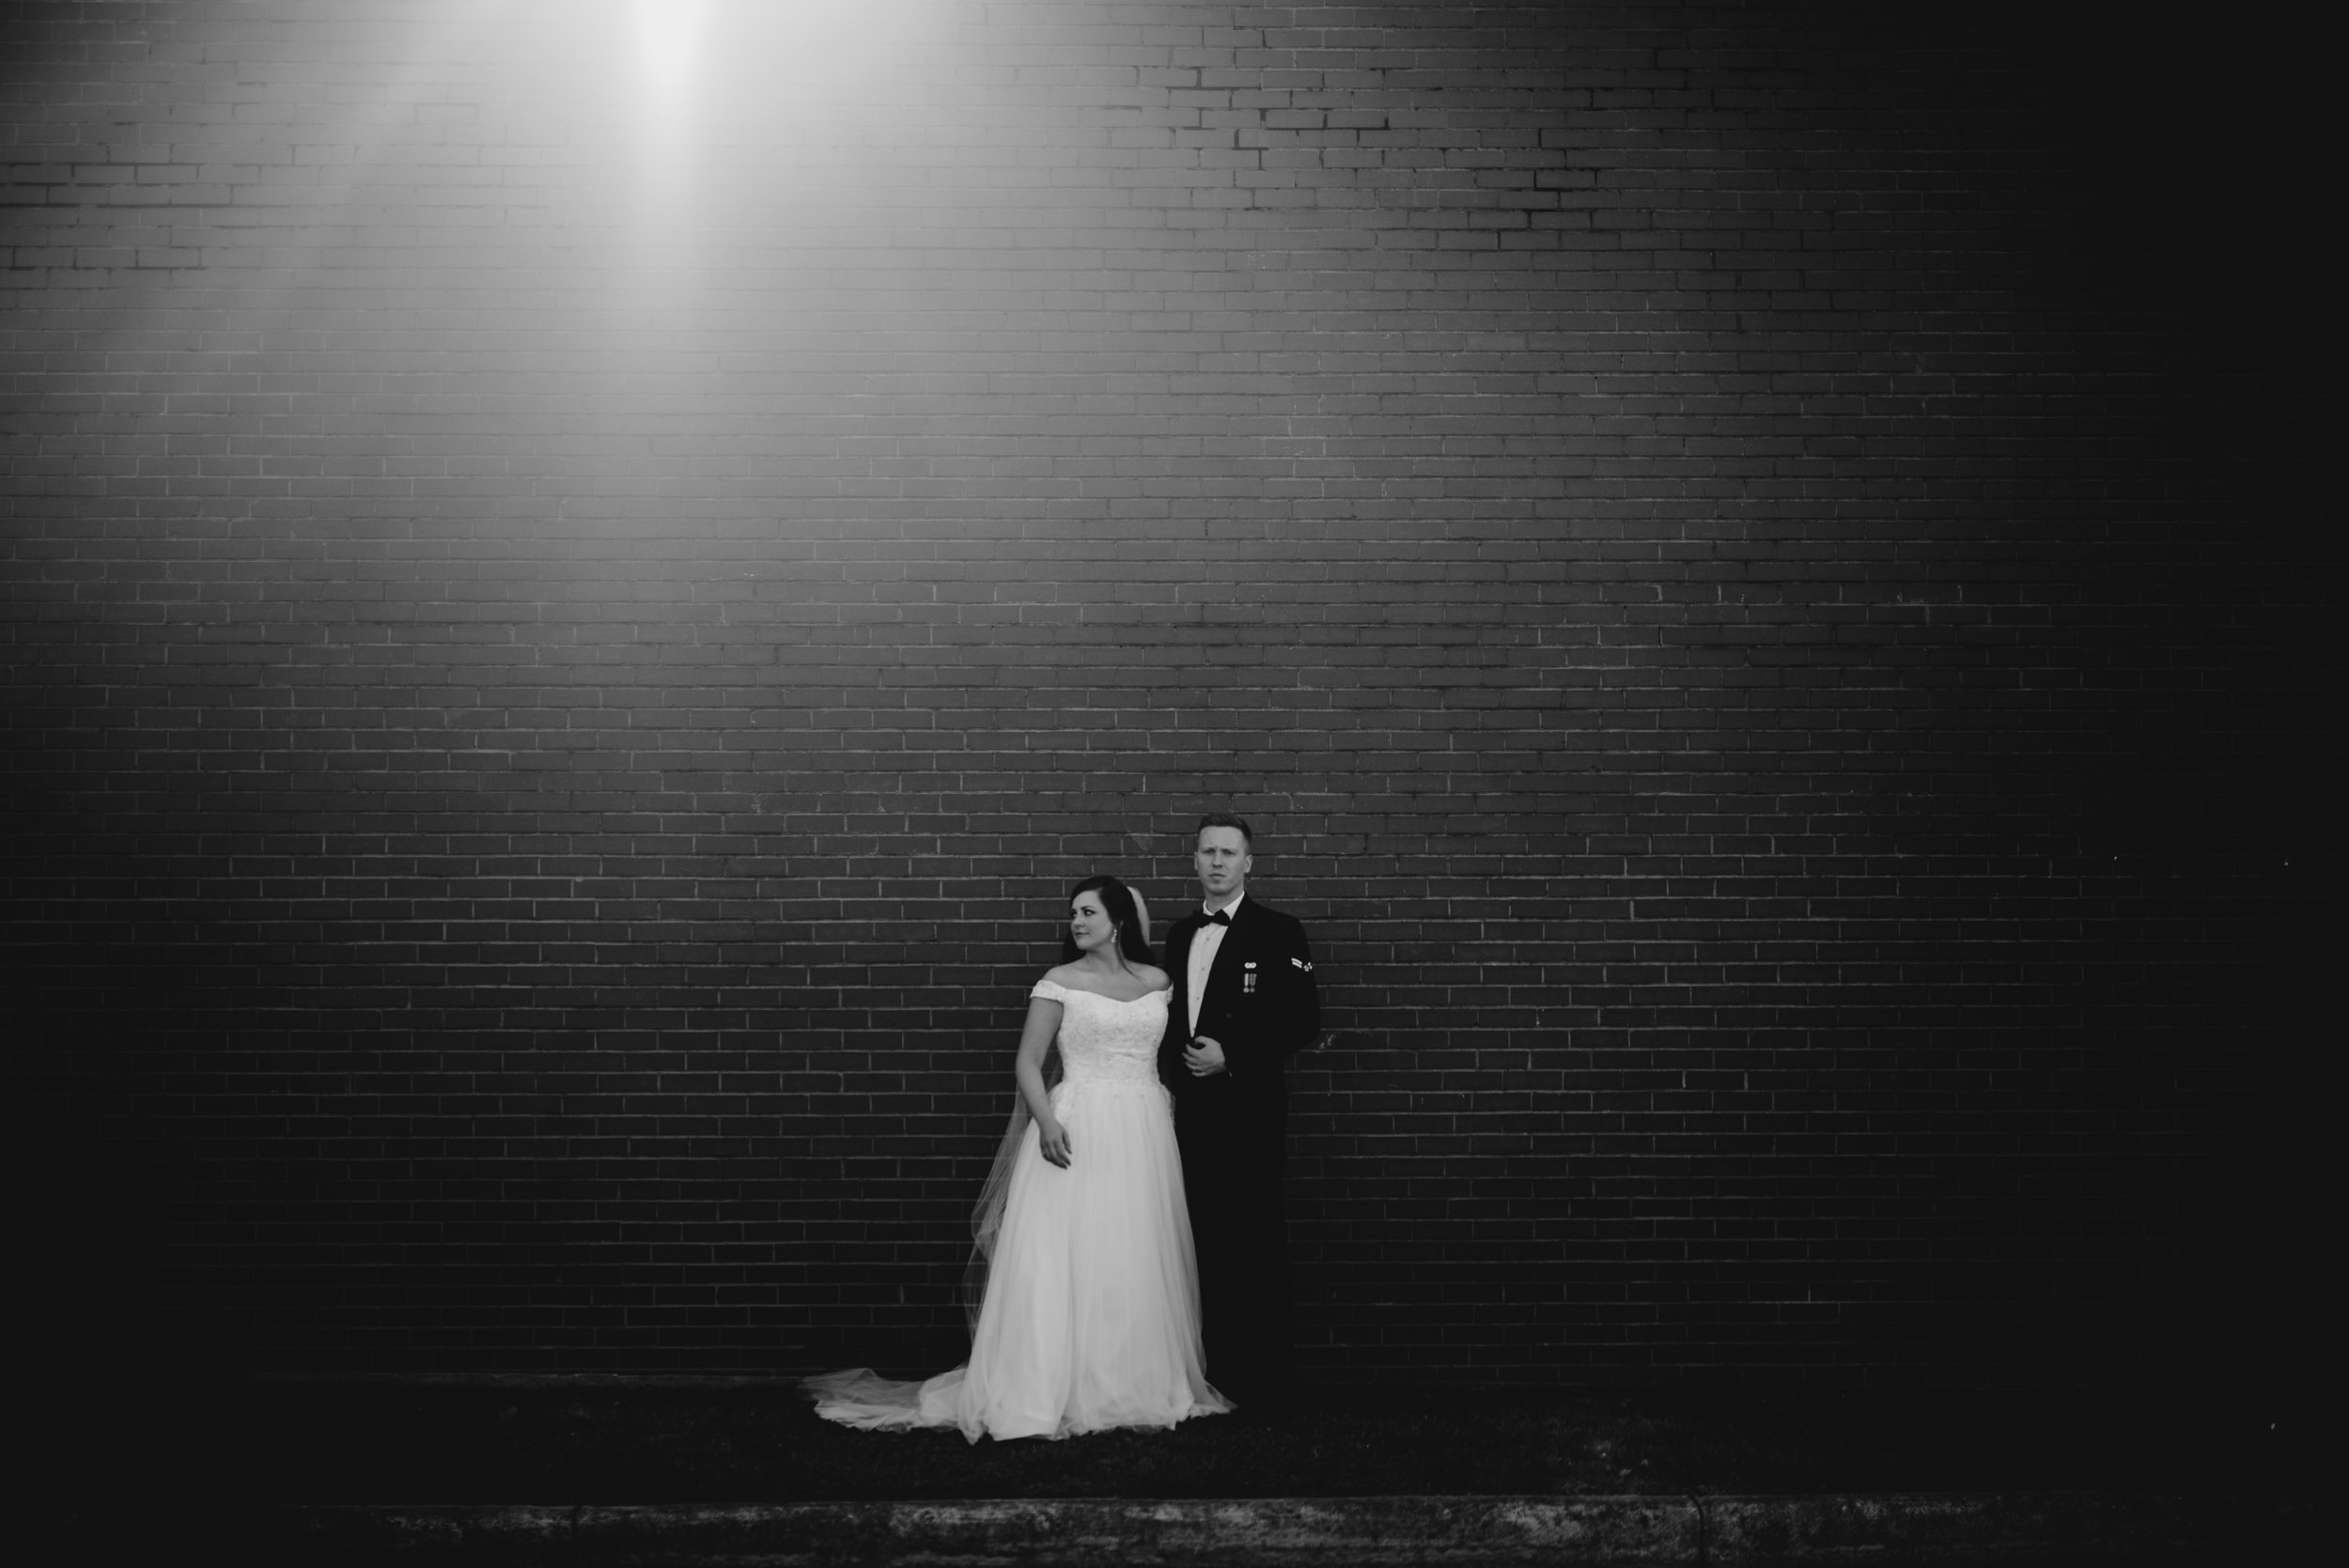 wedding party_williams-49.jpg